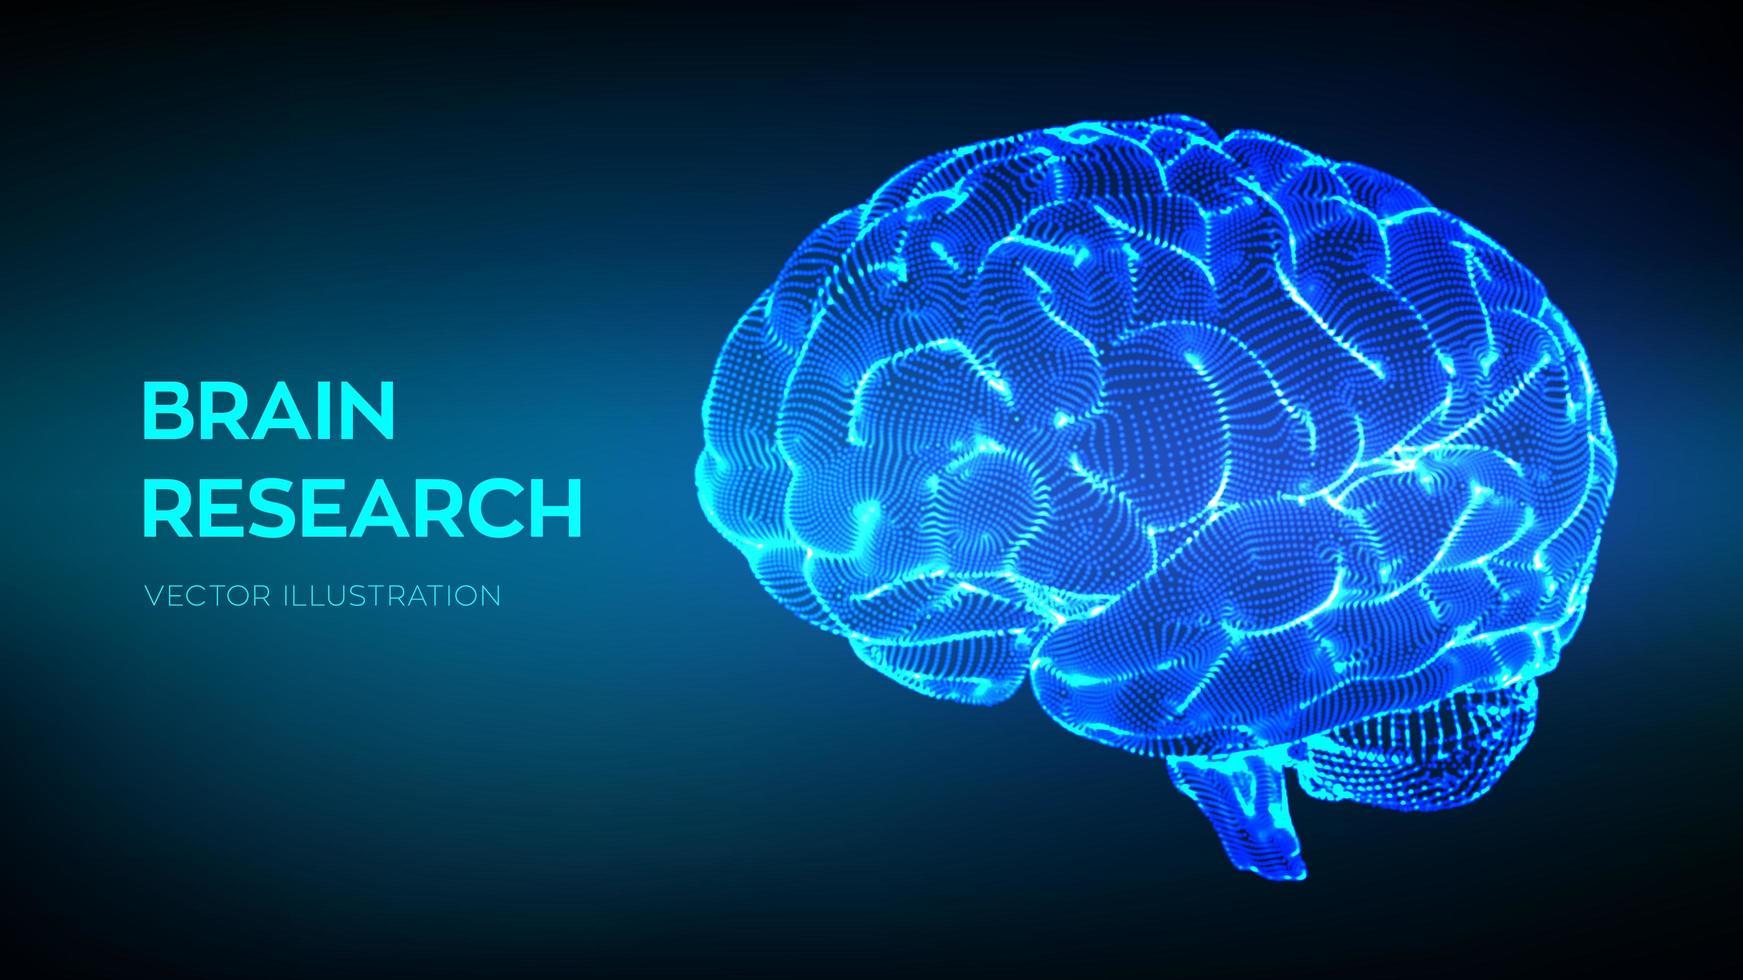 pesquisa do cérebro humano vetor